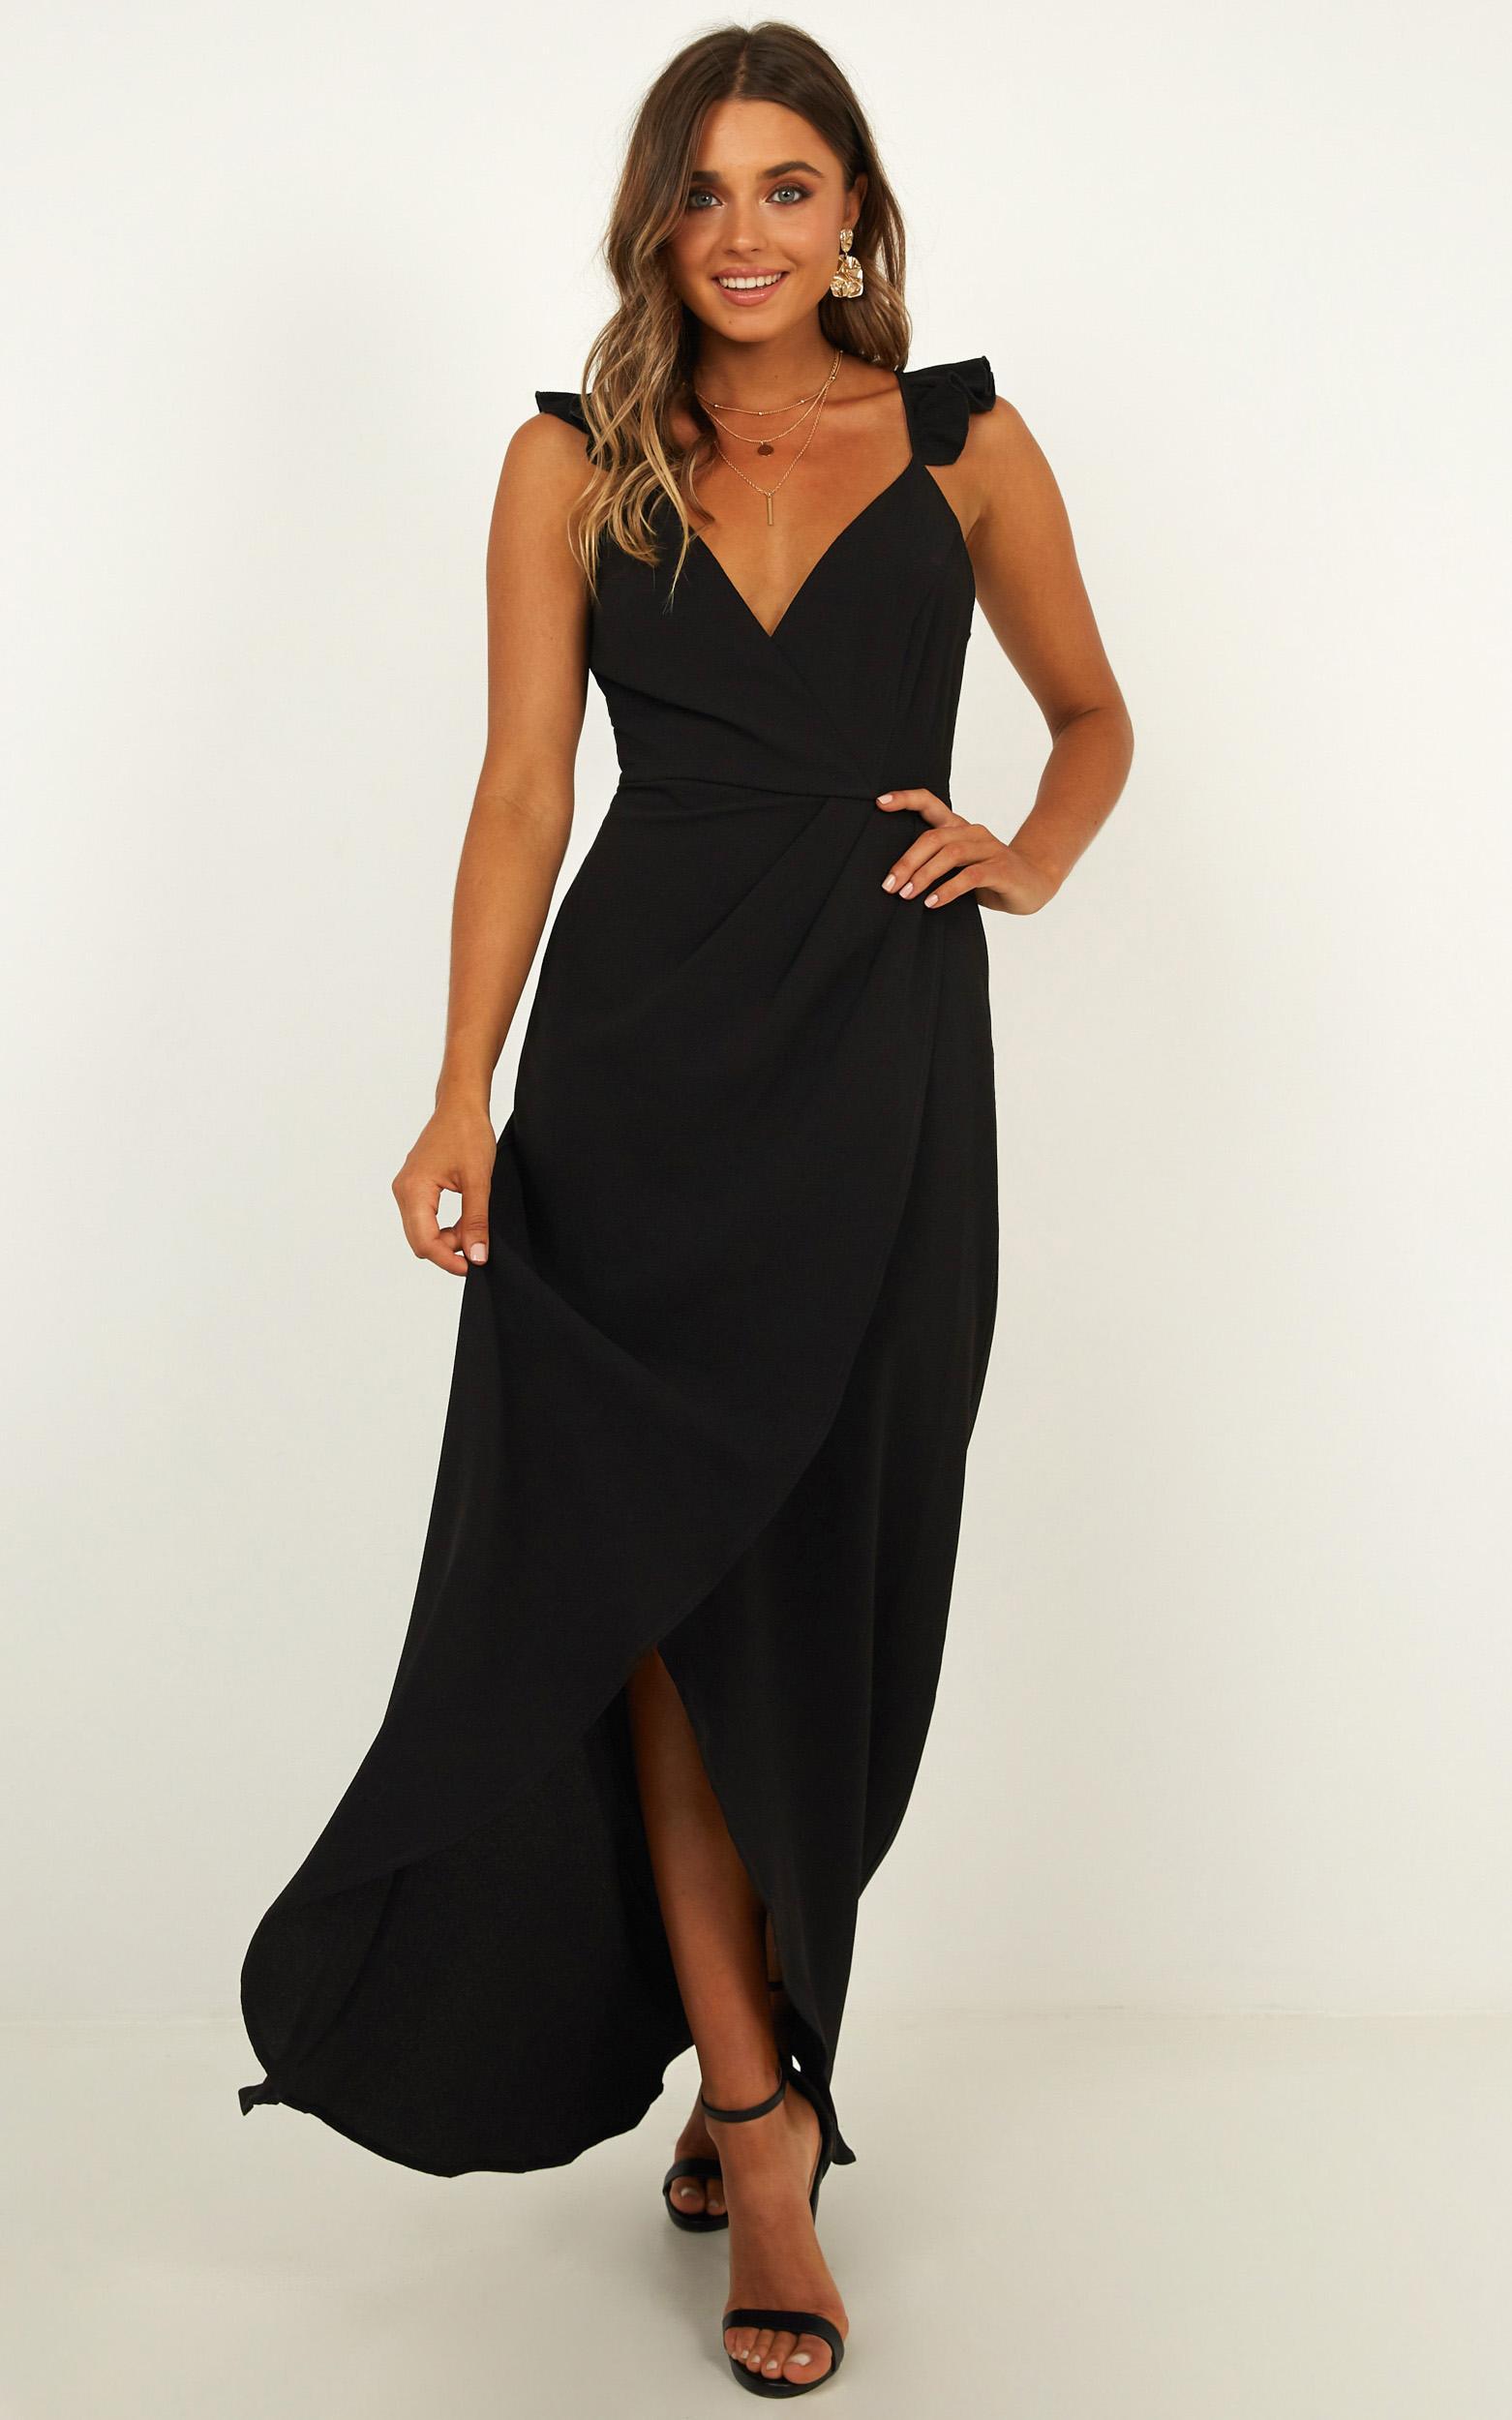 Trust Nobody Dress in black - 14 (XL), Black, hi-res image number null